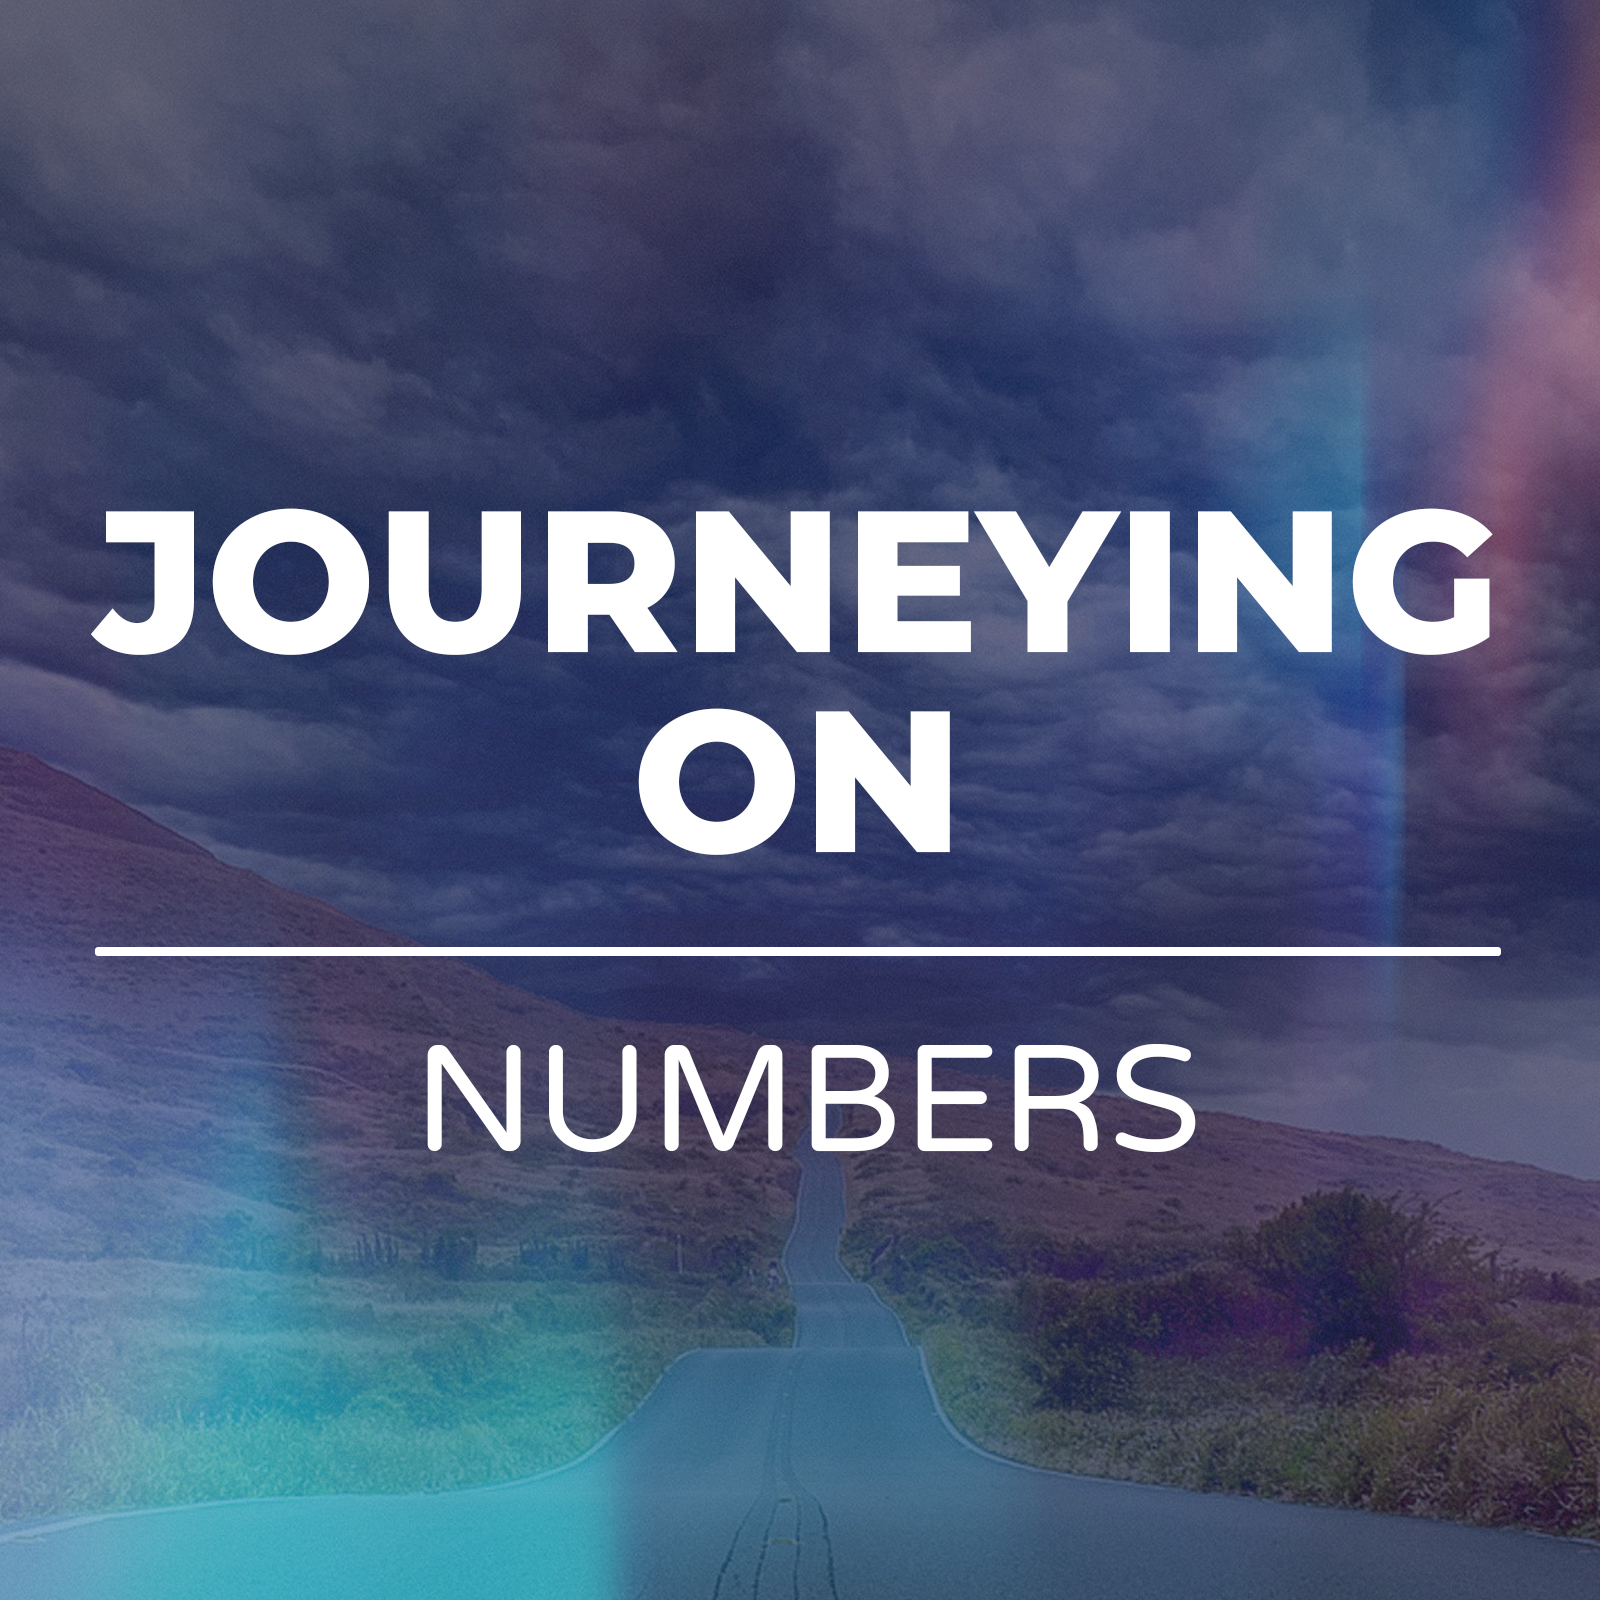 Journeying On - Numbers - Sermon Series - Hope Church Huddersfield